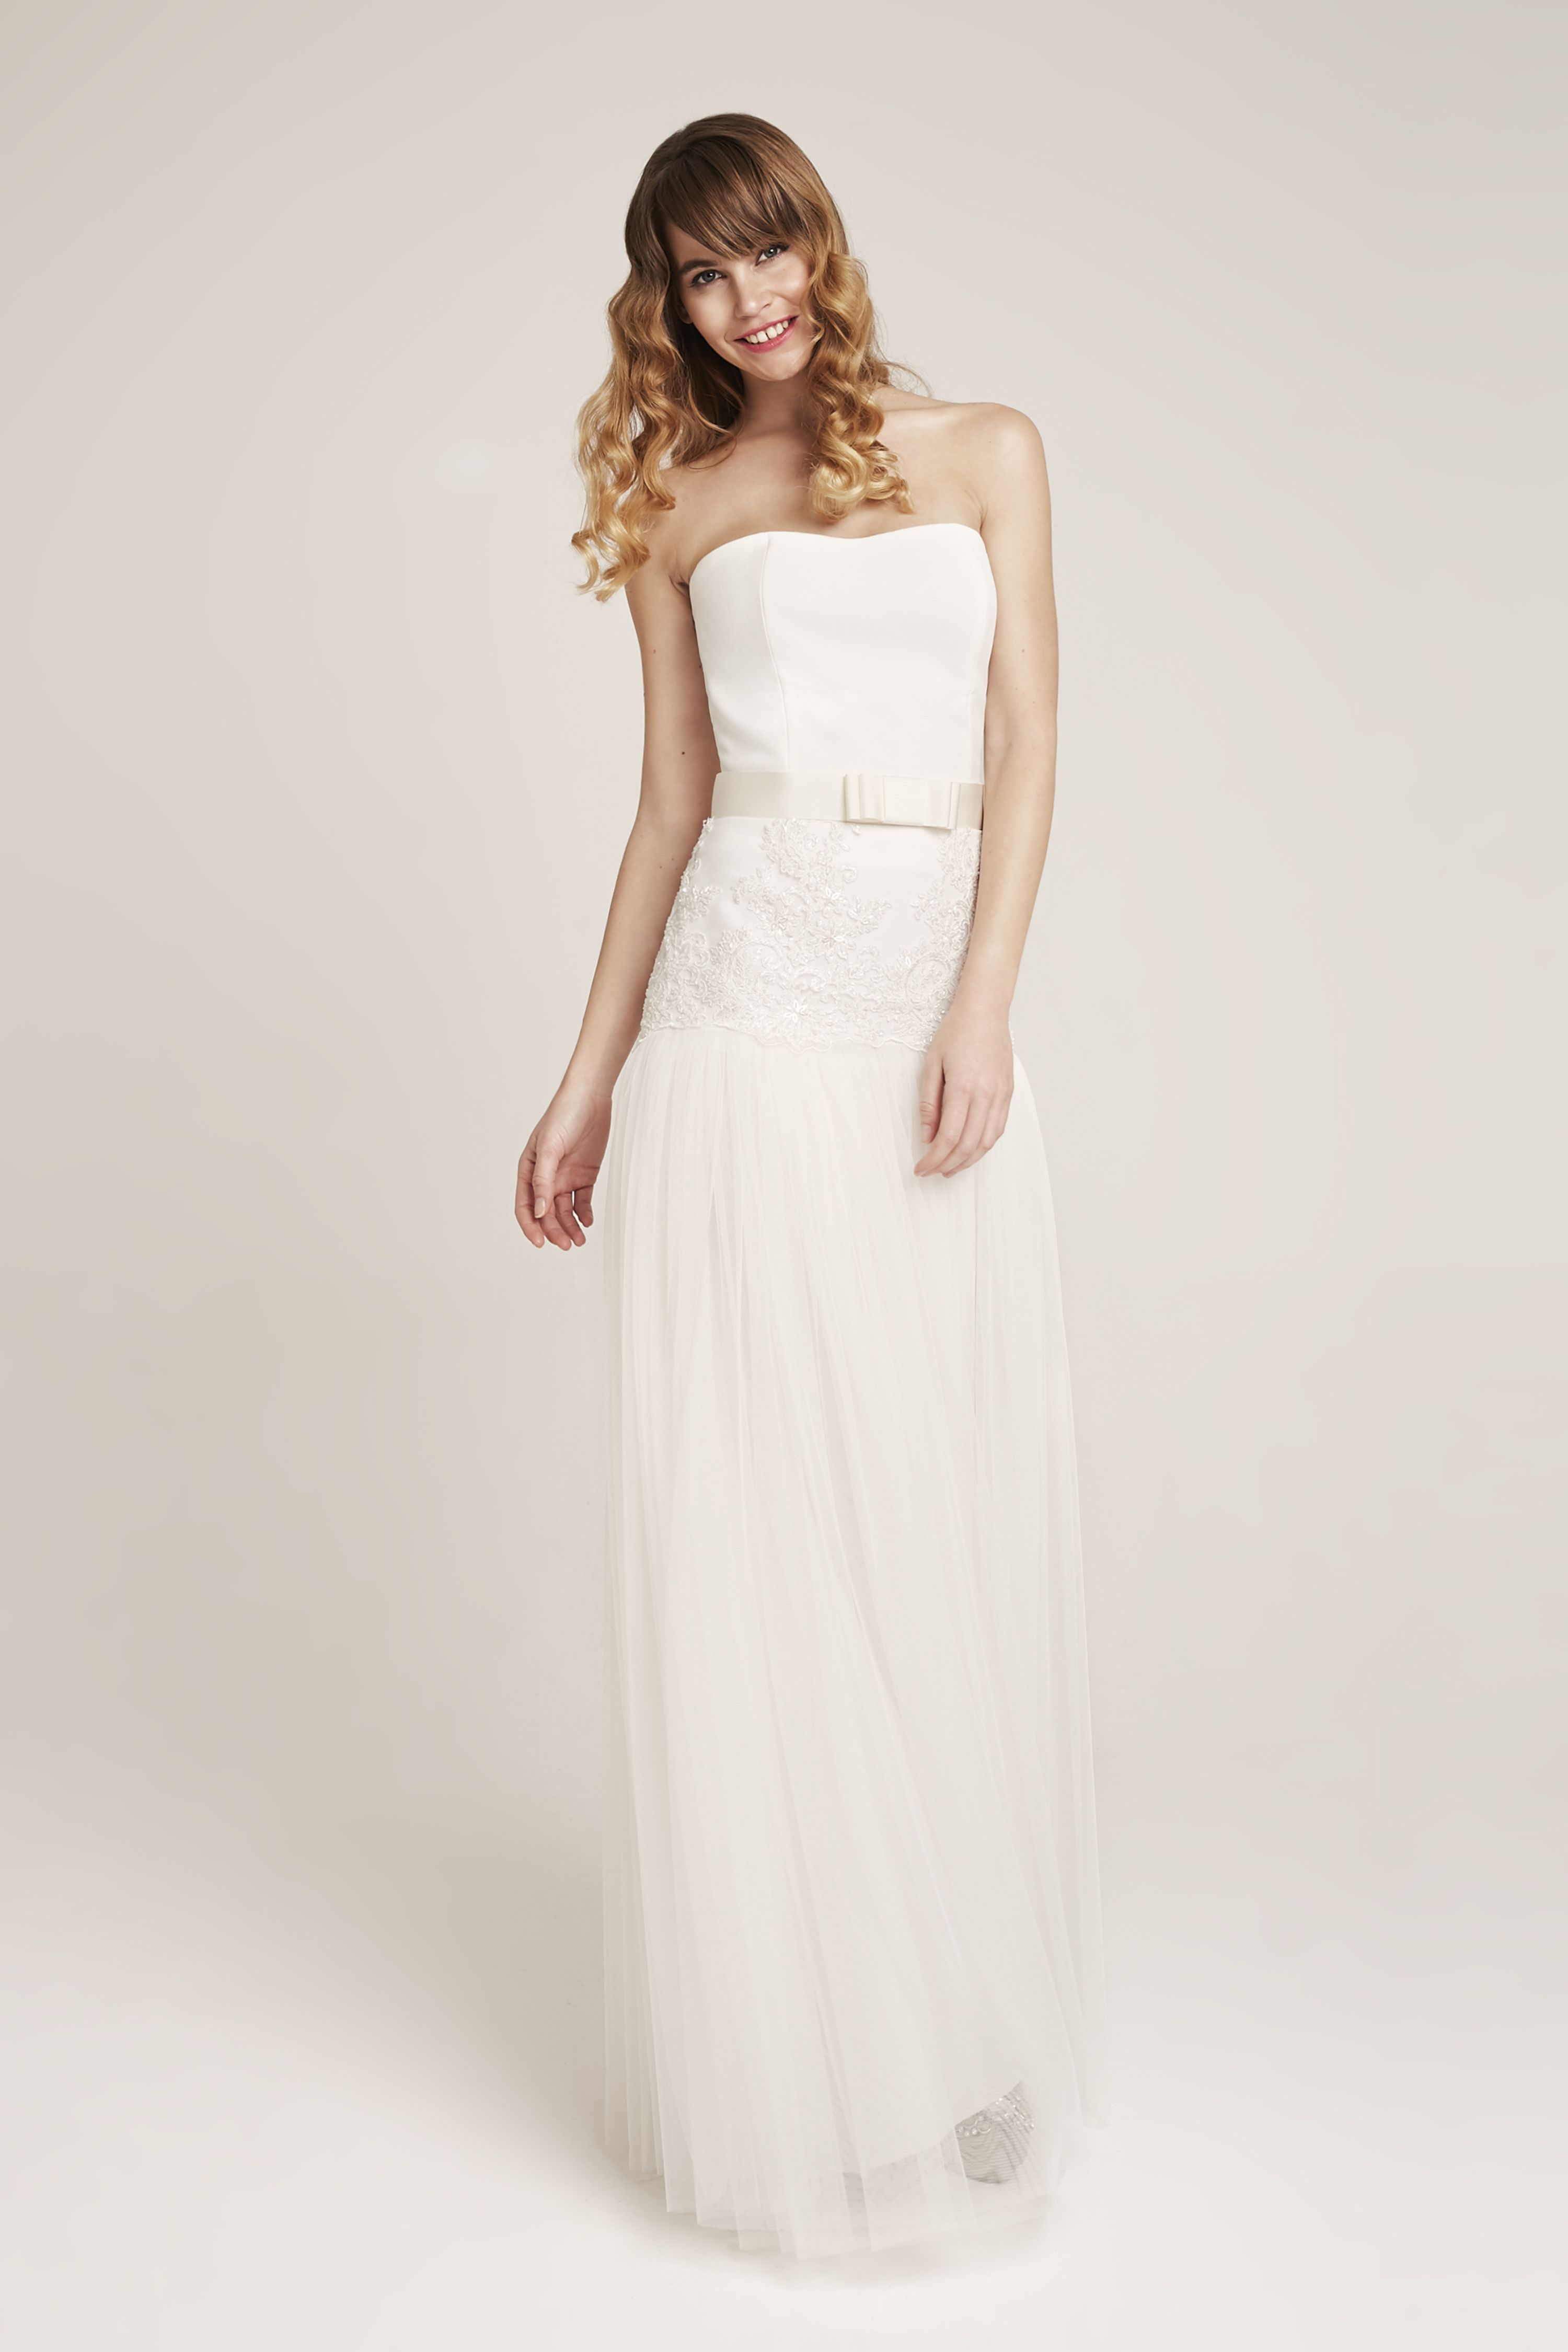 Brady bride corset rania bride skirt and simple bow belt